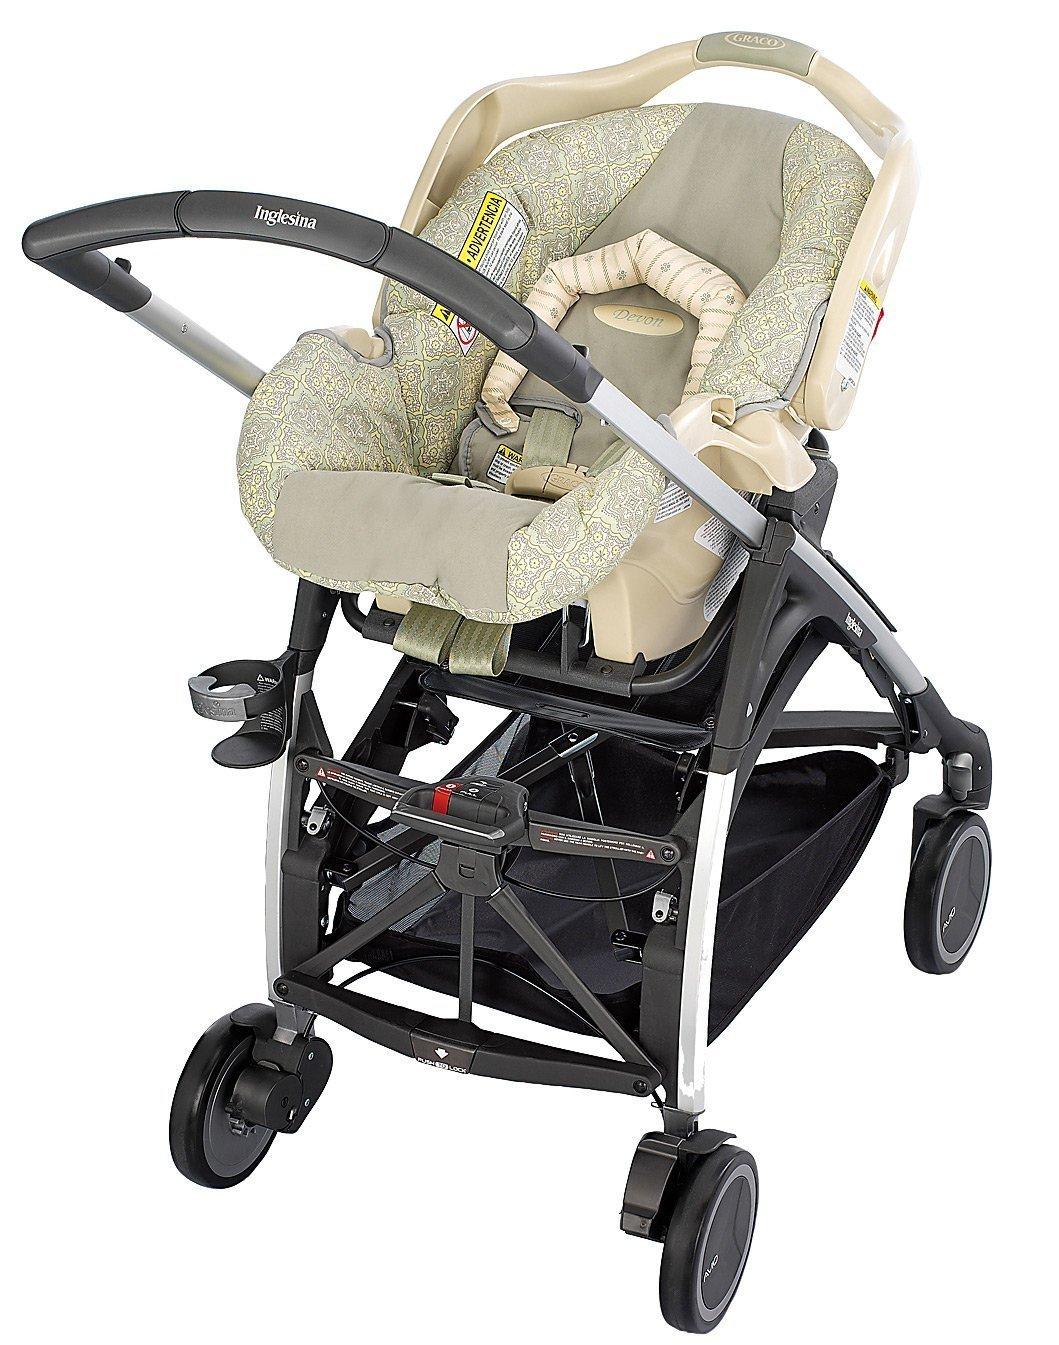 Inglesina Avio Adapter for Graco Infant Car Seat, Gray